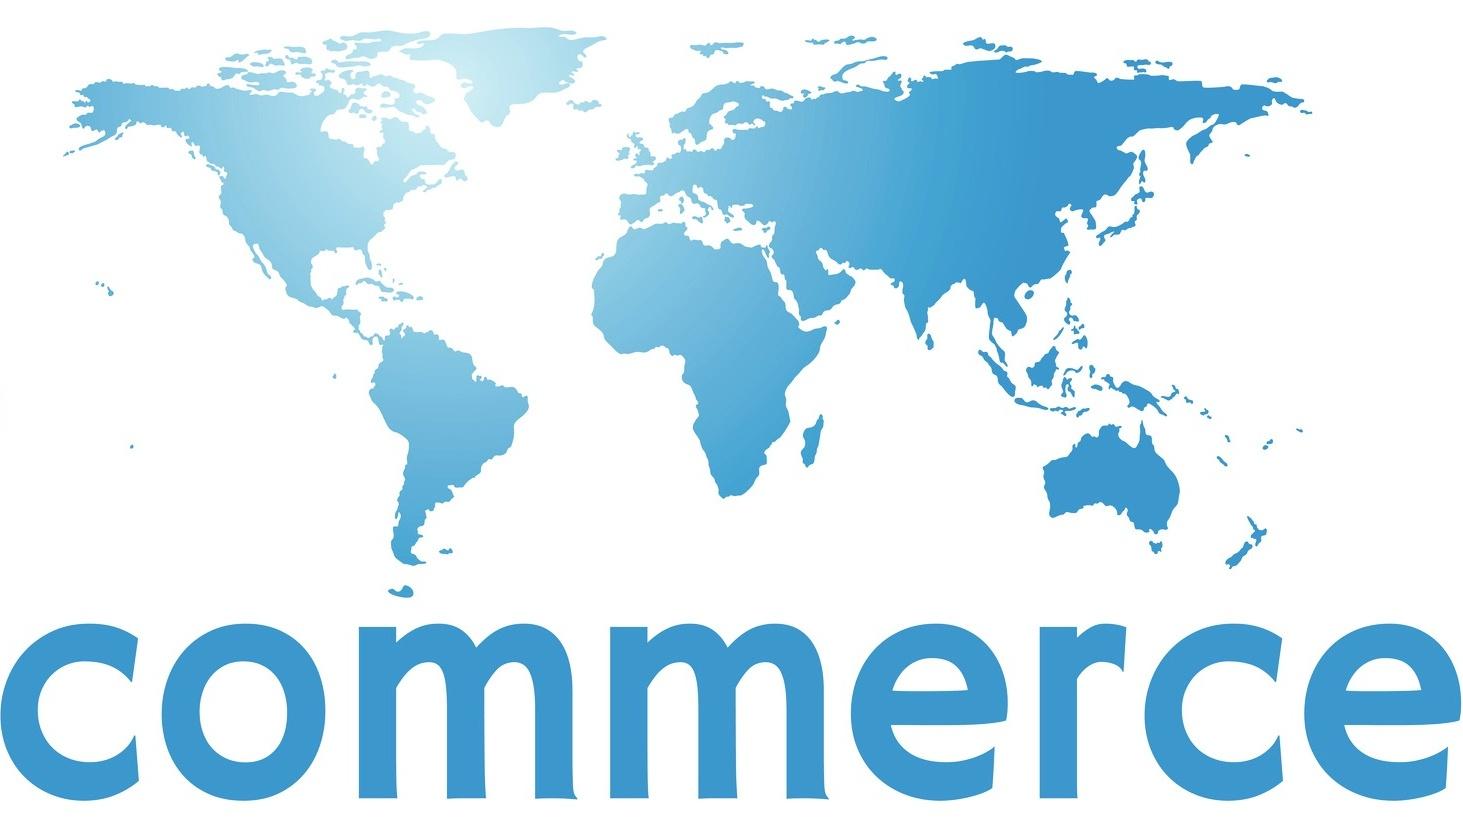 ecommerce global earth internet world word